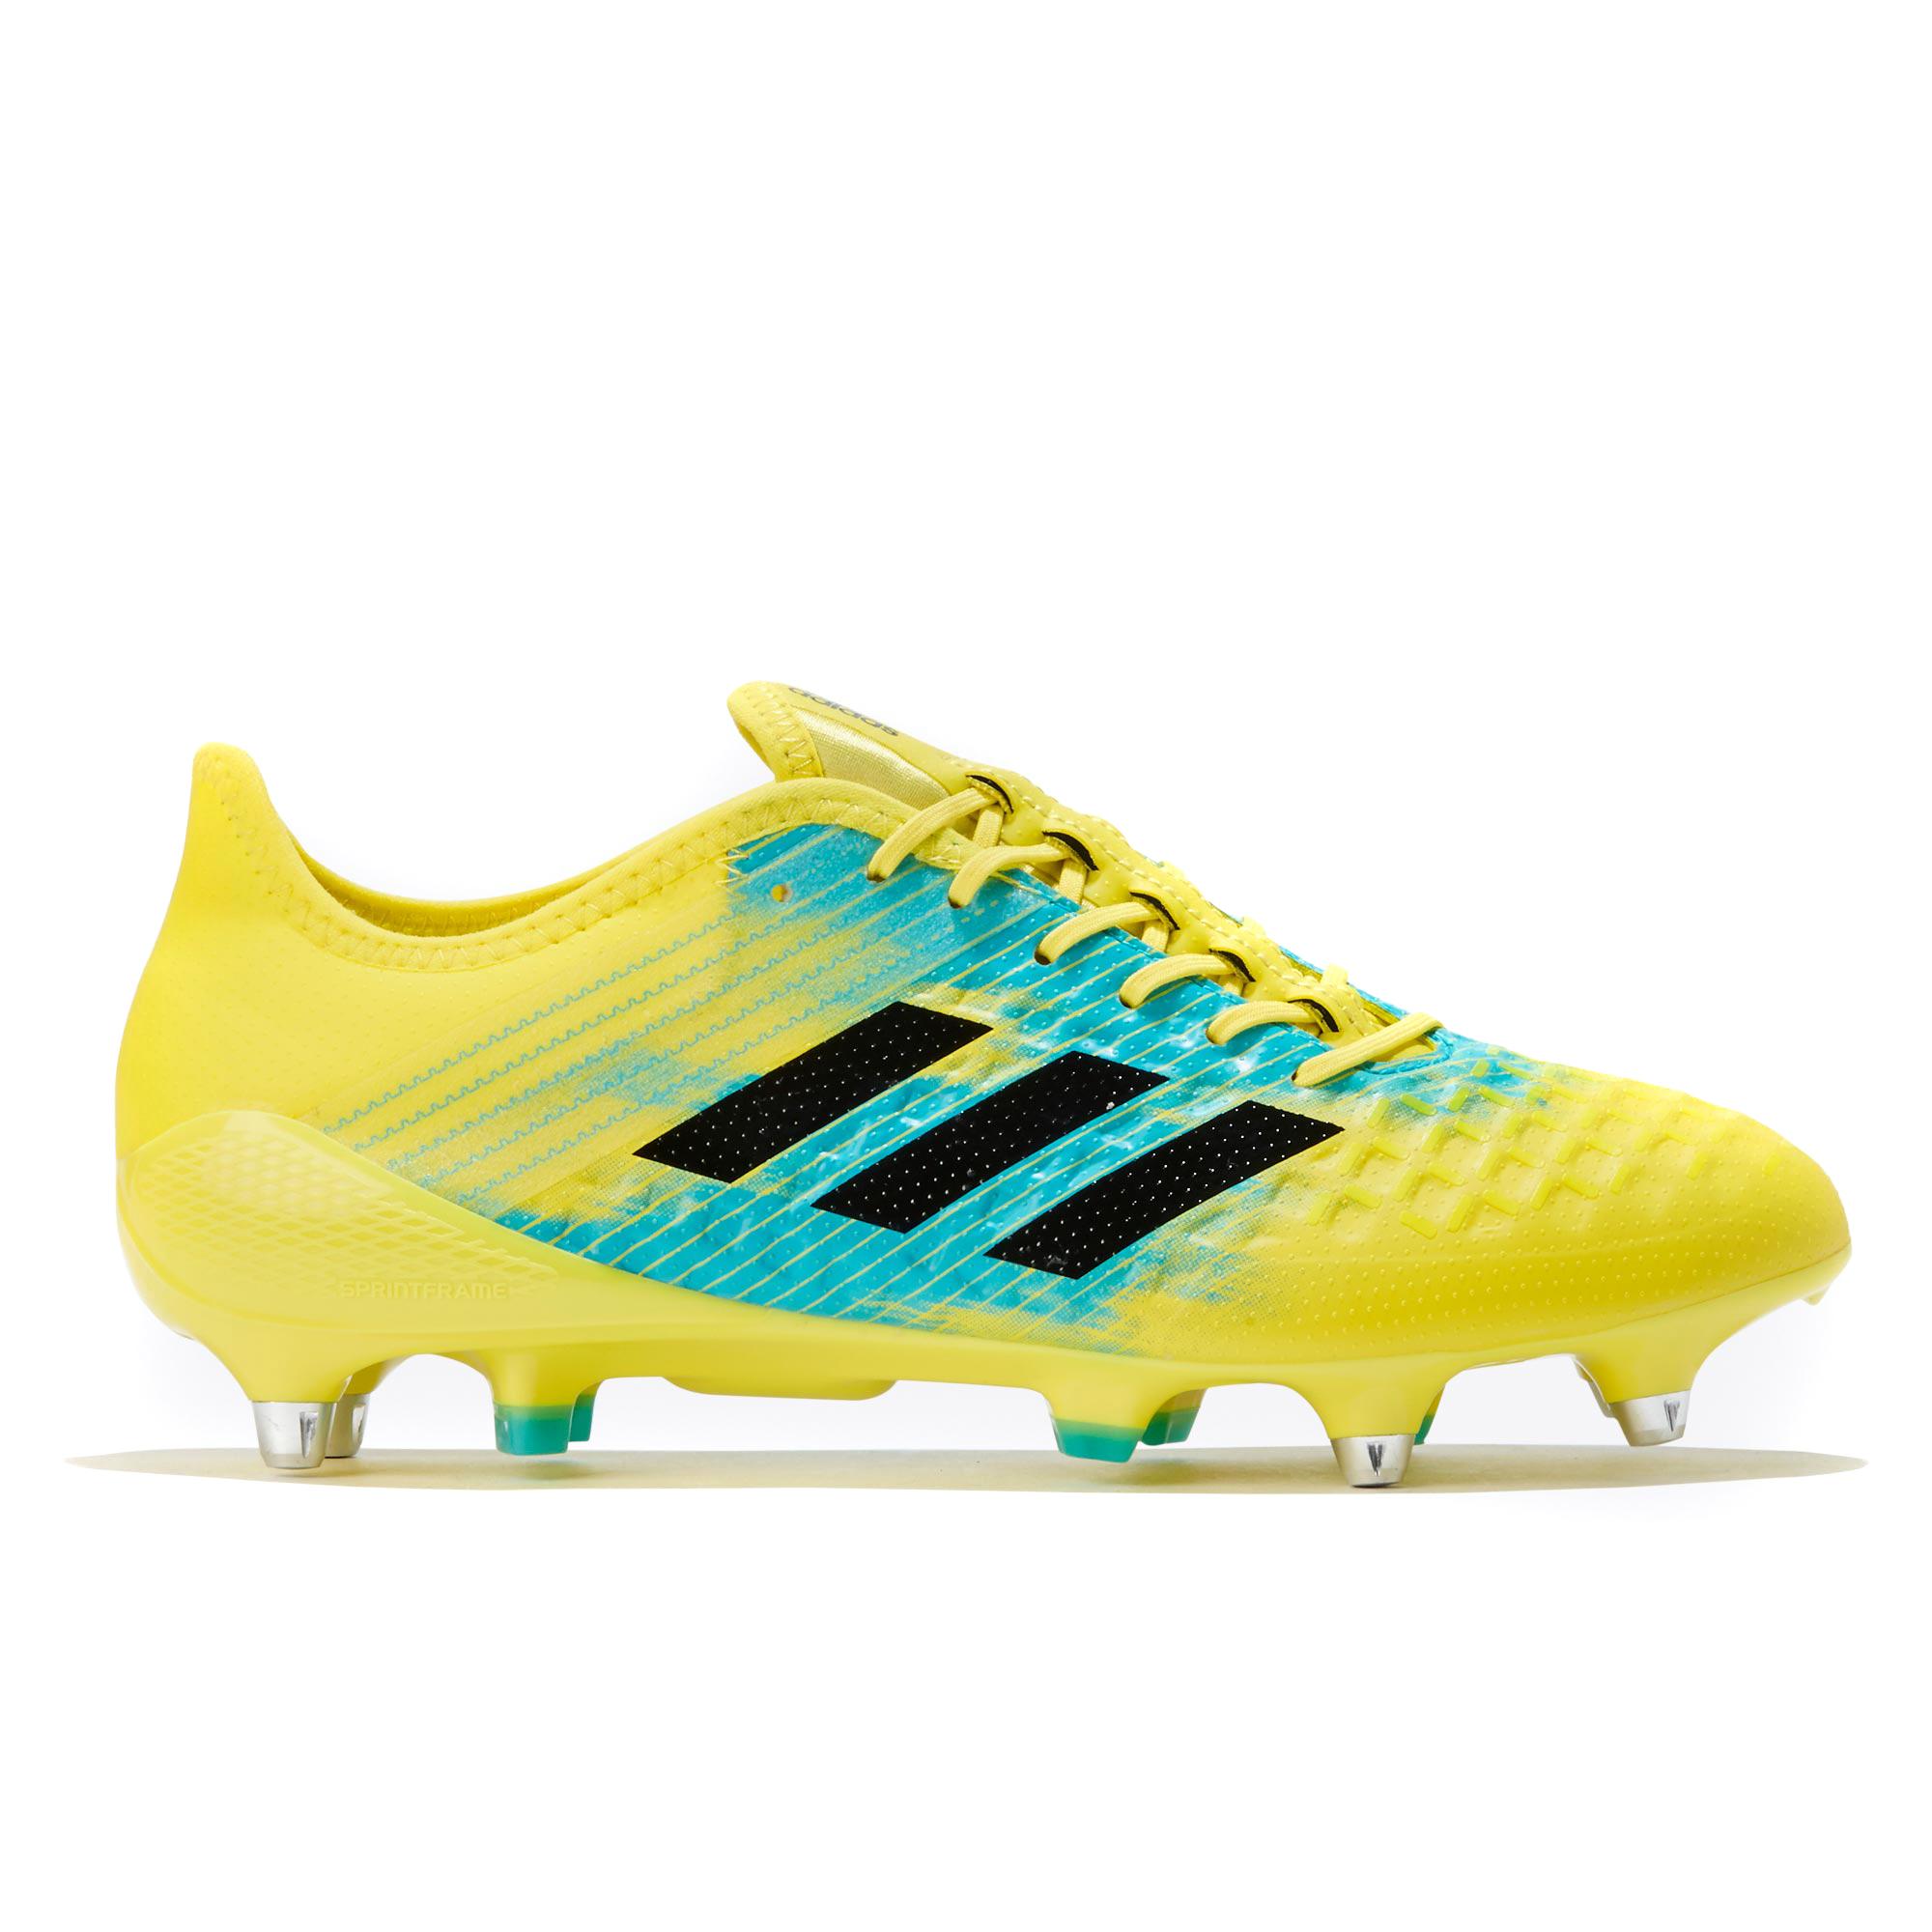 "Image of ""adidas Predator Malice Control - Soft Ground Rugby Boot - Yellow/Black/Aqua"""